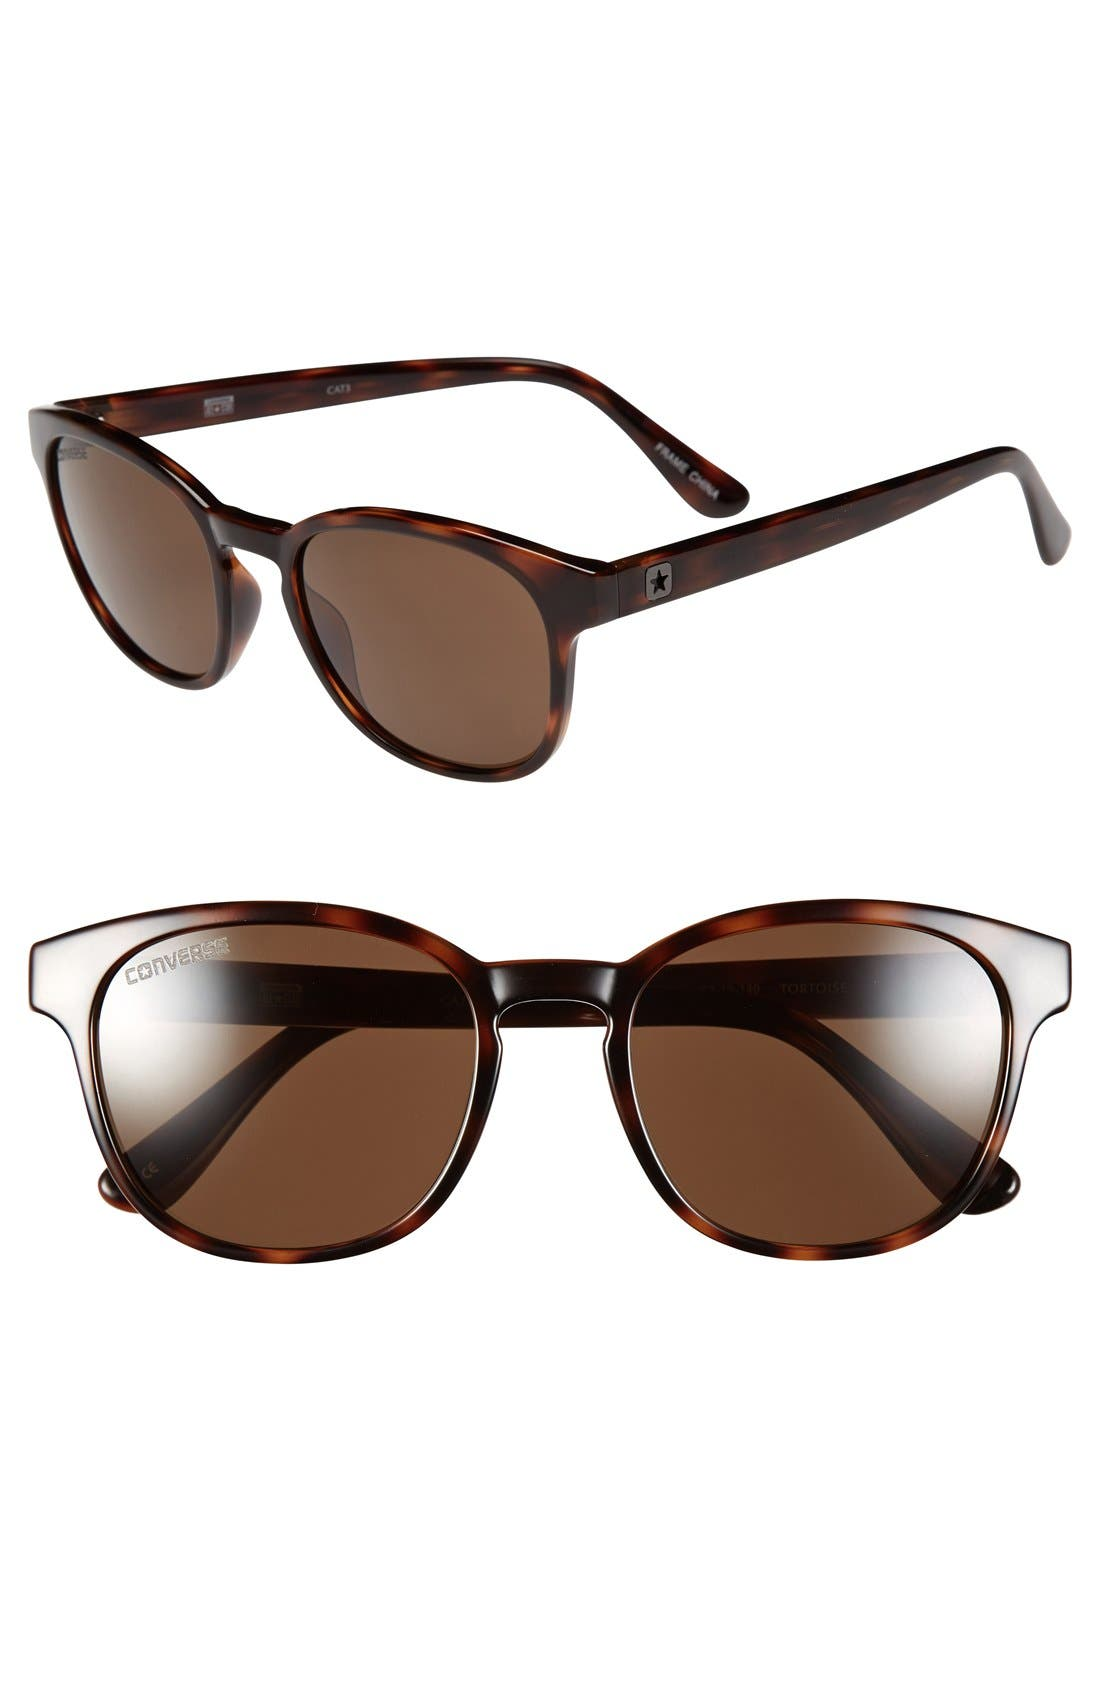 Main Image - Converse 52mm Retro Sunglasses